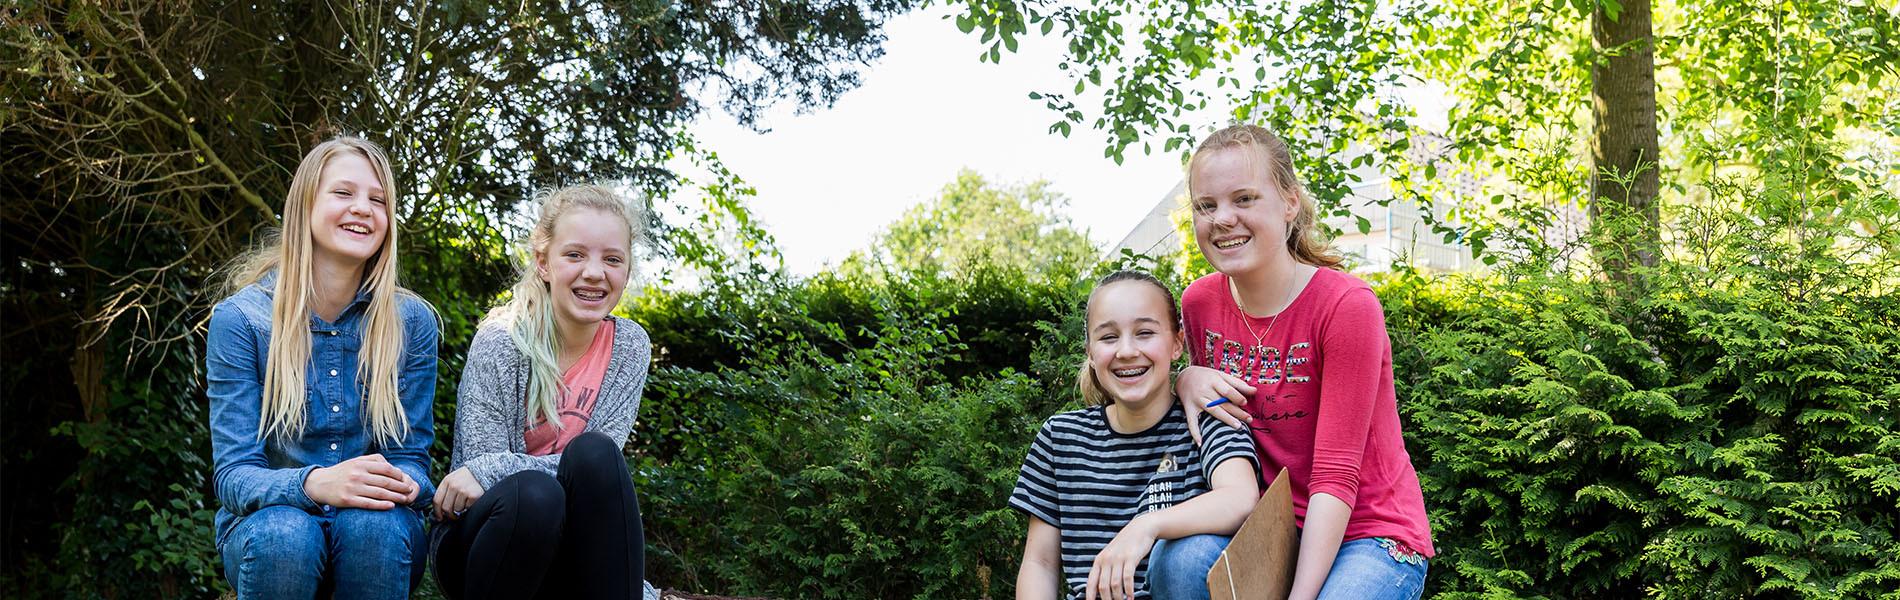 VMBO Nijkerk vier meisjes buiten